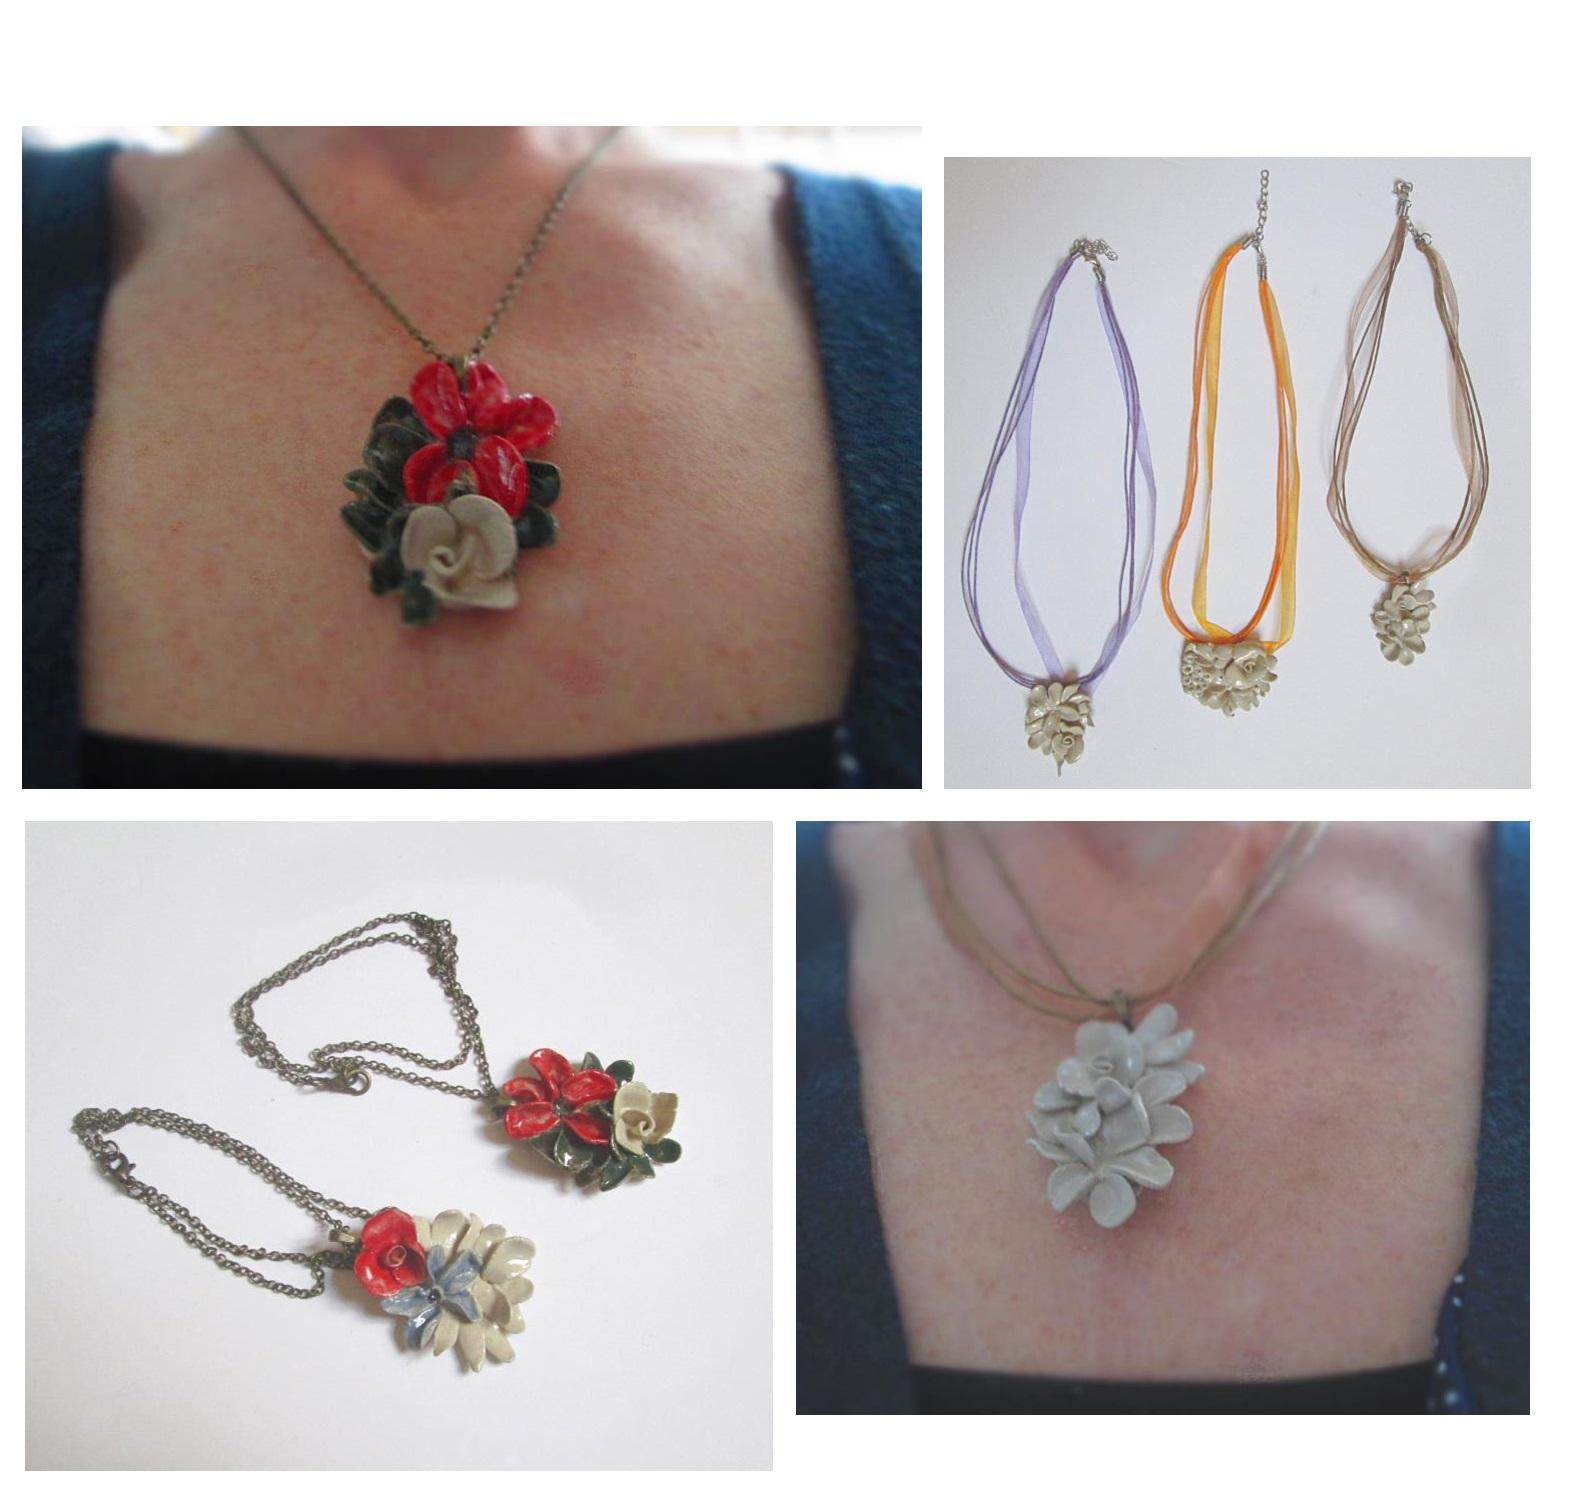 bijoux céramique fait main colliers fleurs, gioielli fatti a mano in ceramica , handmade ceramic jewelery